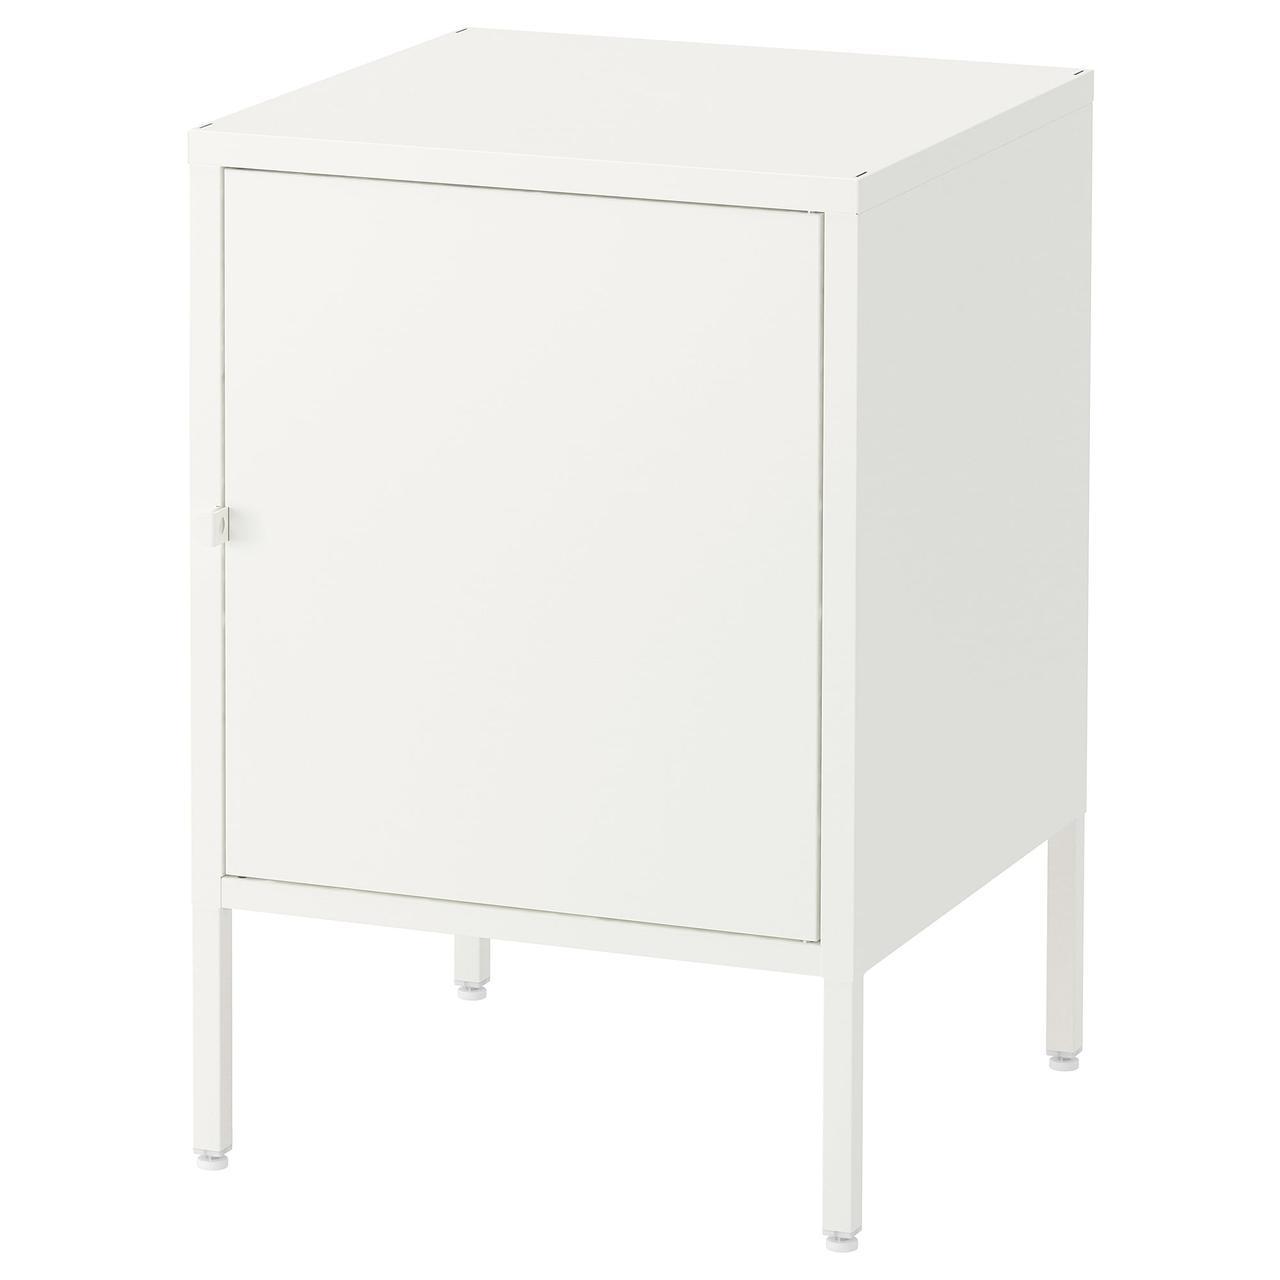 ХЭЛЛАН Комбинация для хранения с дверцами, белый